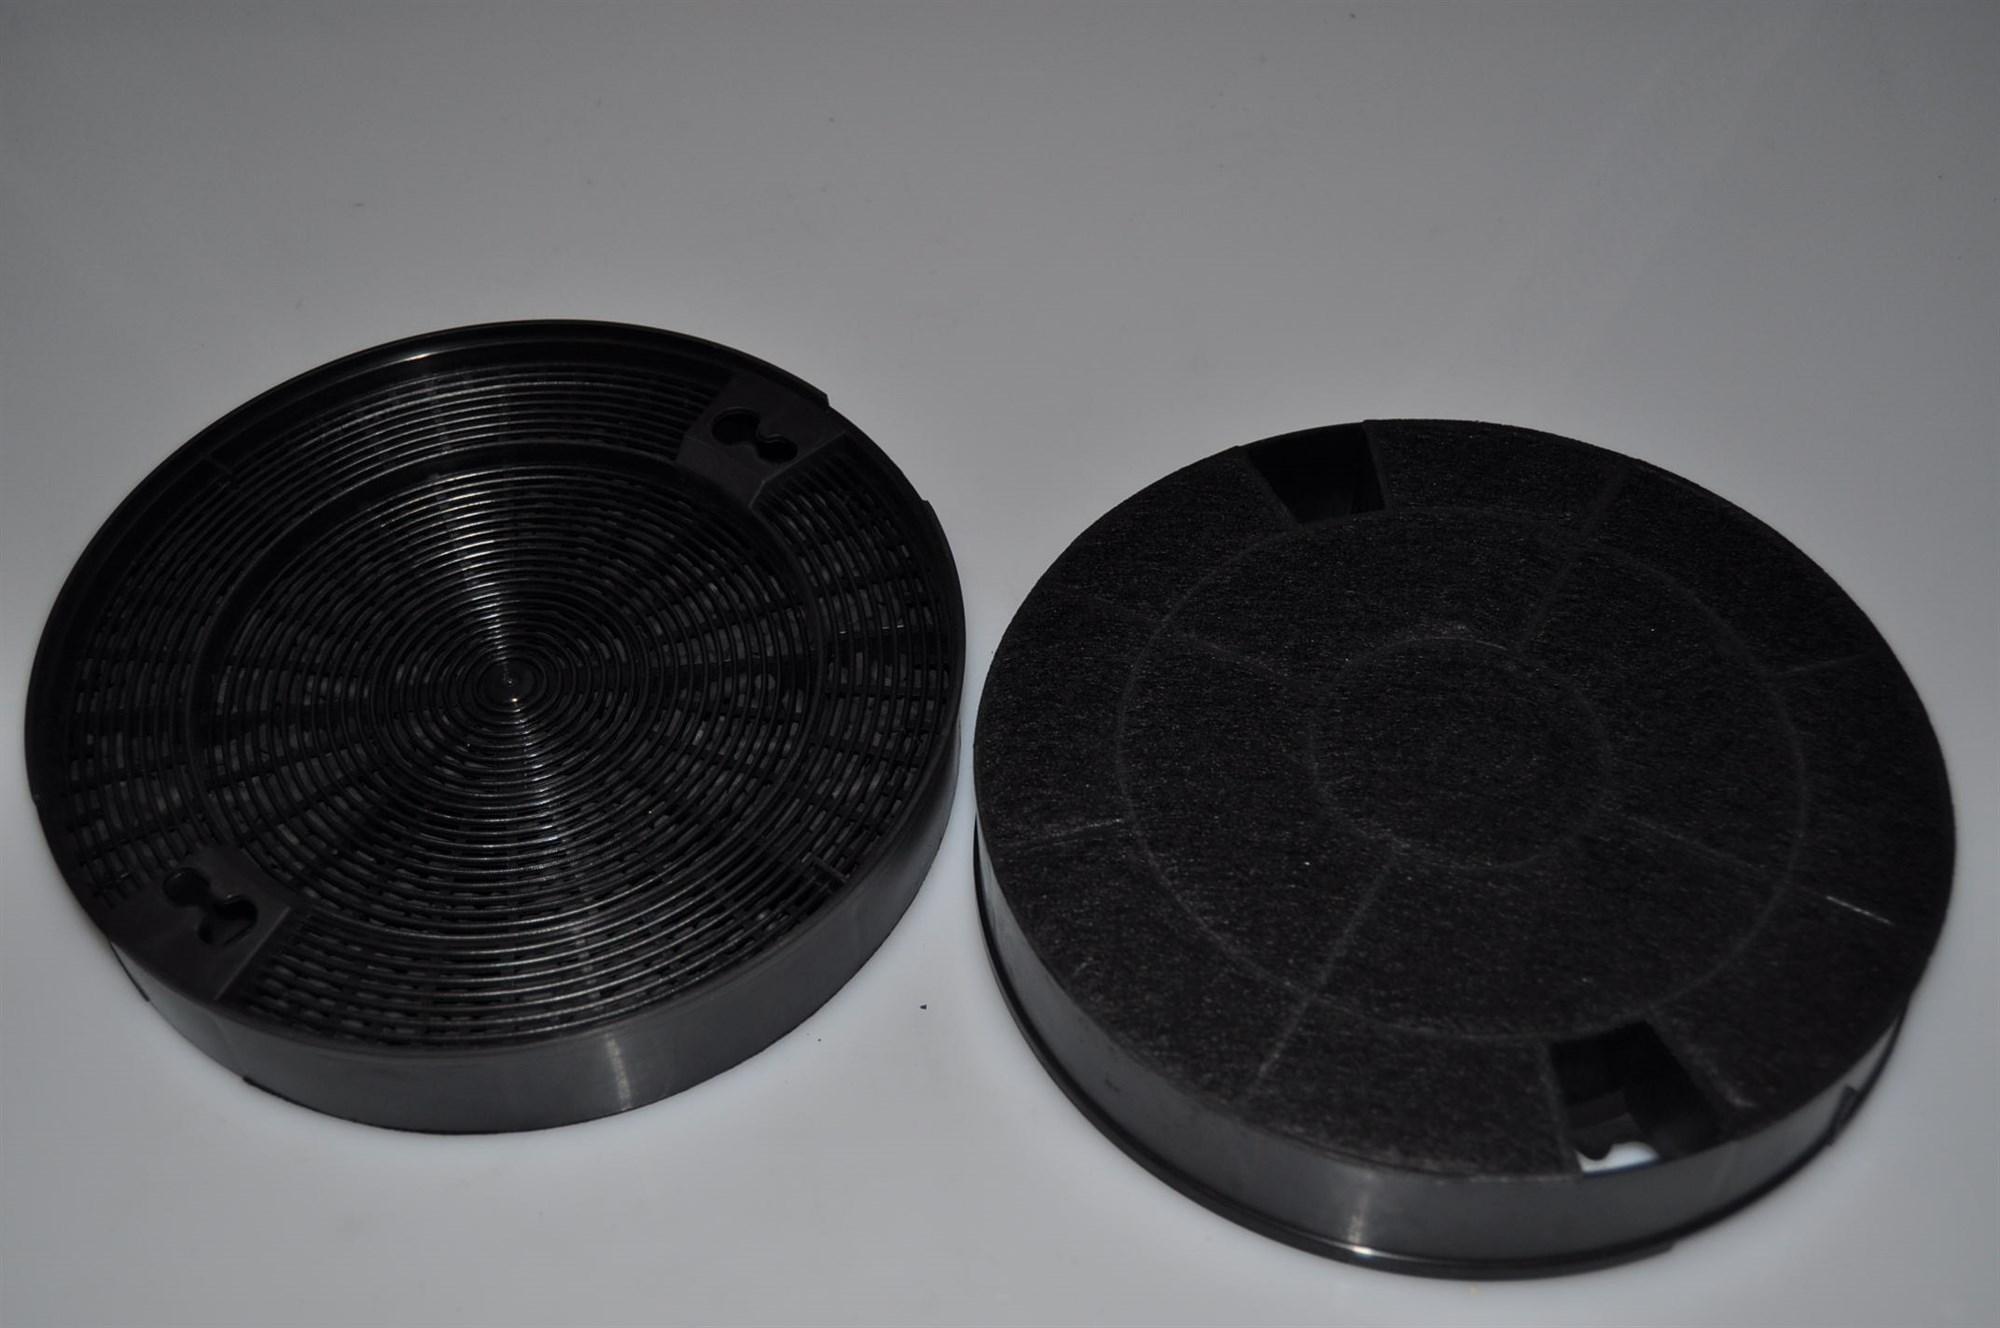 Kohlefilter ikea dunstabzugshaube 35 mm 2 stck